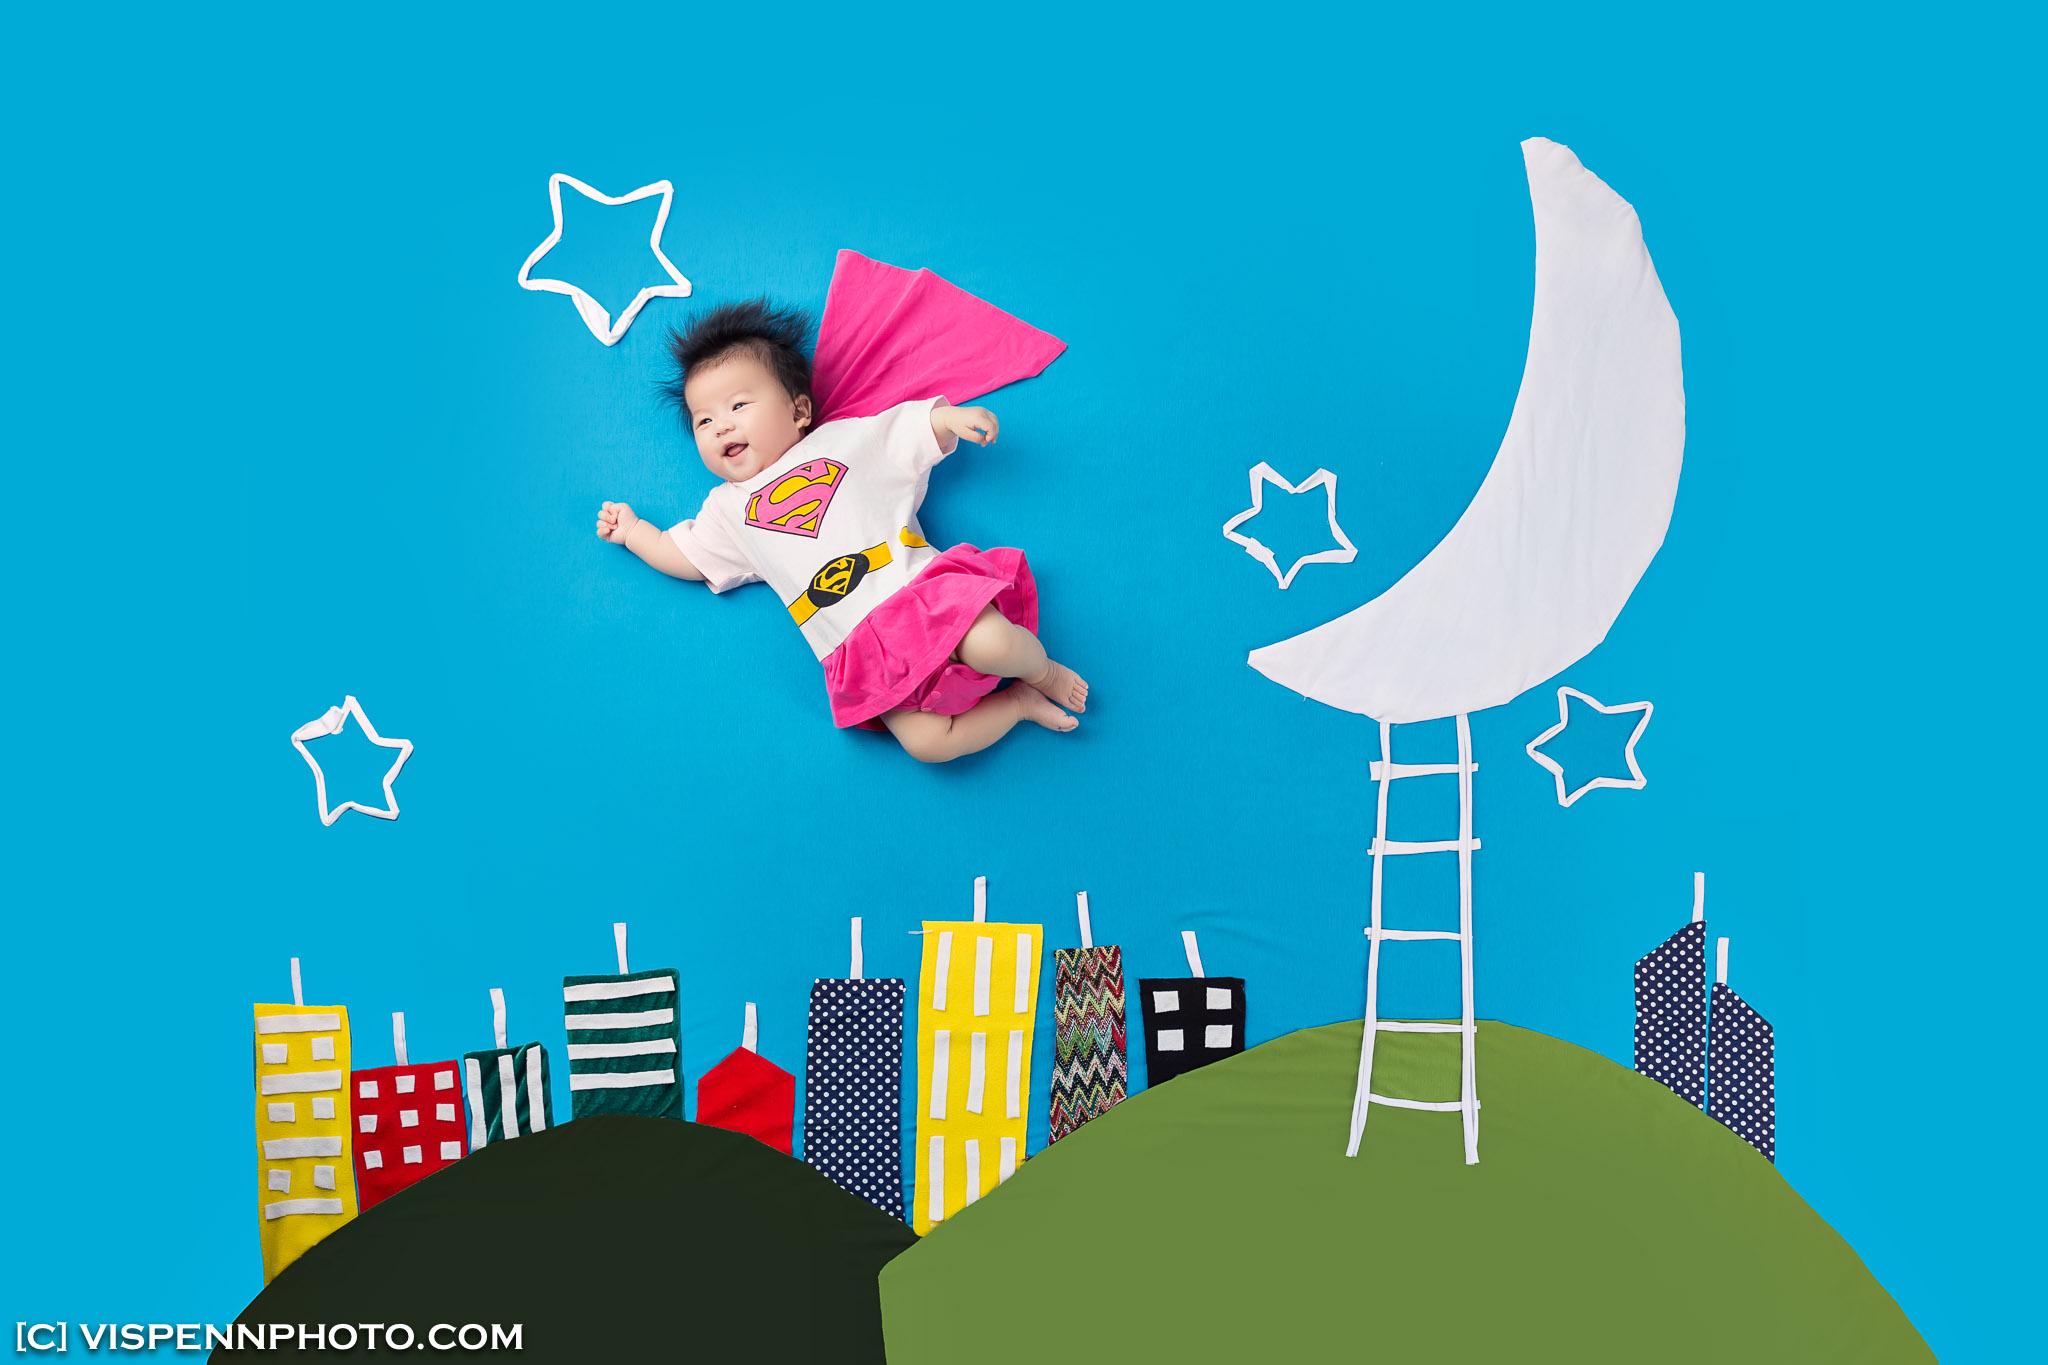 Melbourne Newborn Baby Family Photo BaoBao VISPENN 墨尔本 儿童 宝宝 百天照 满月照 孕妇照 全家福 100DAYS VISPENN FayeGuo 0489